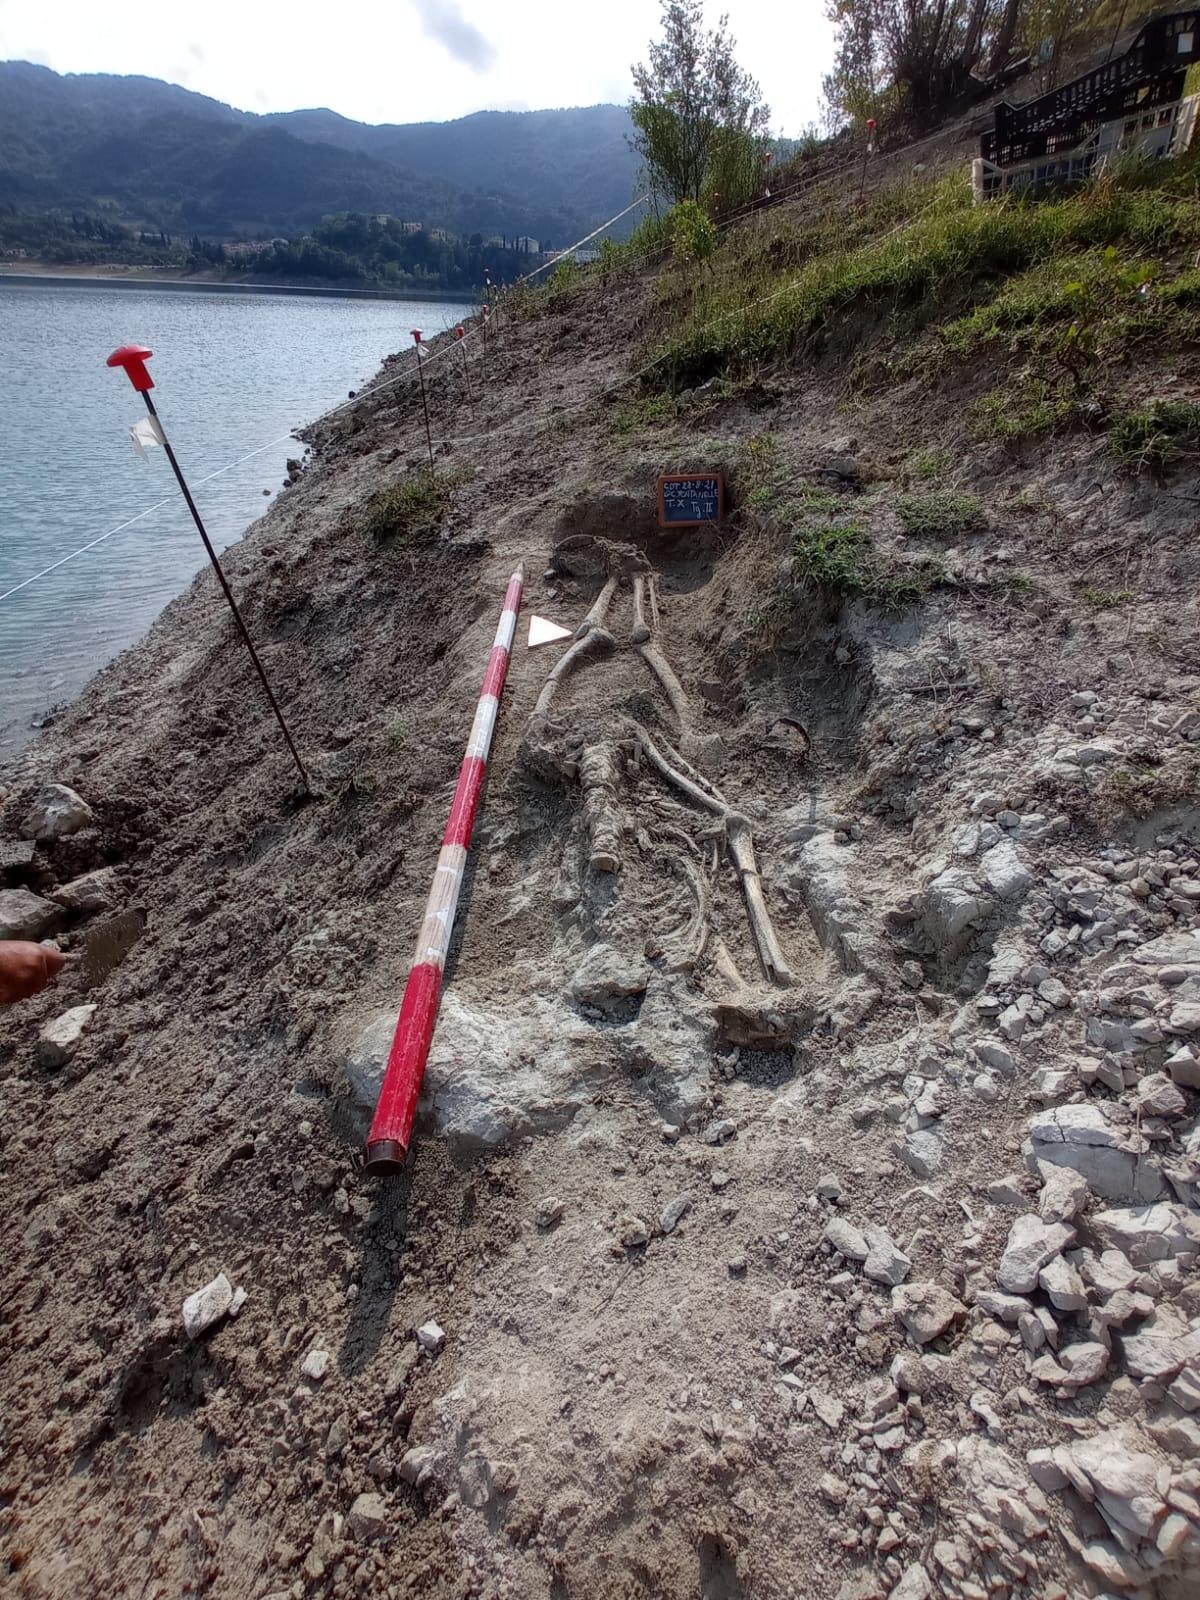 Tomba con scheletro